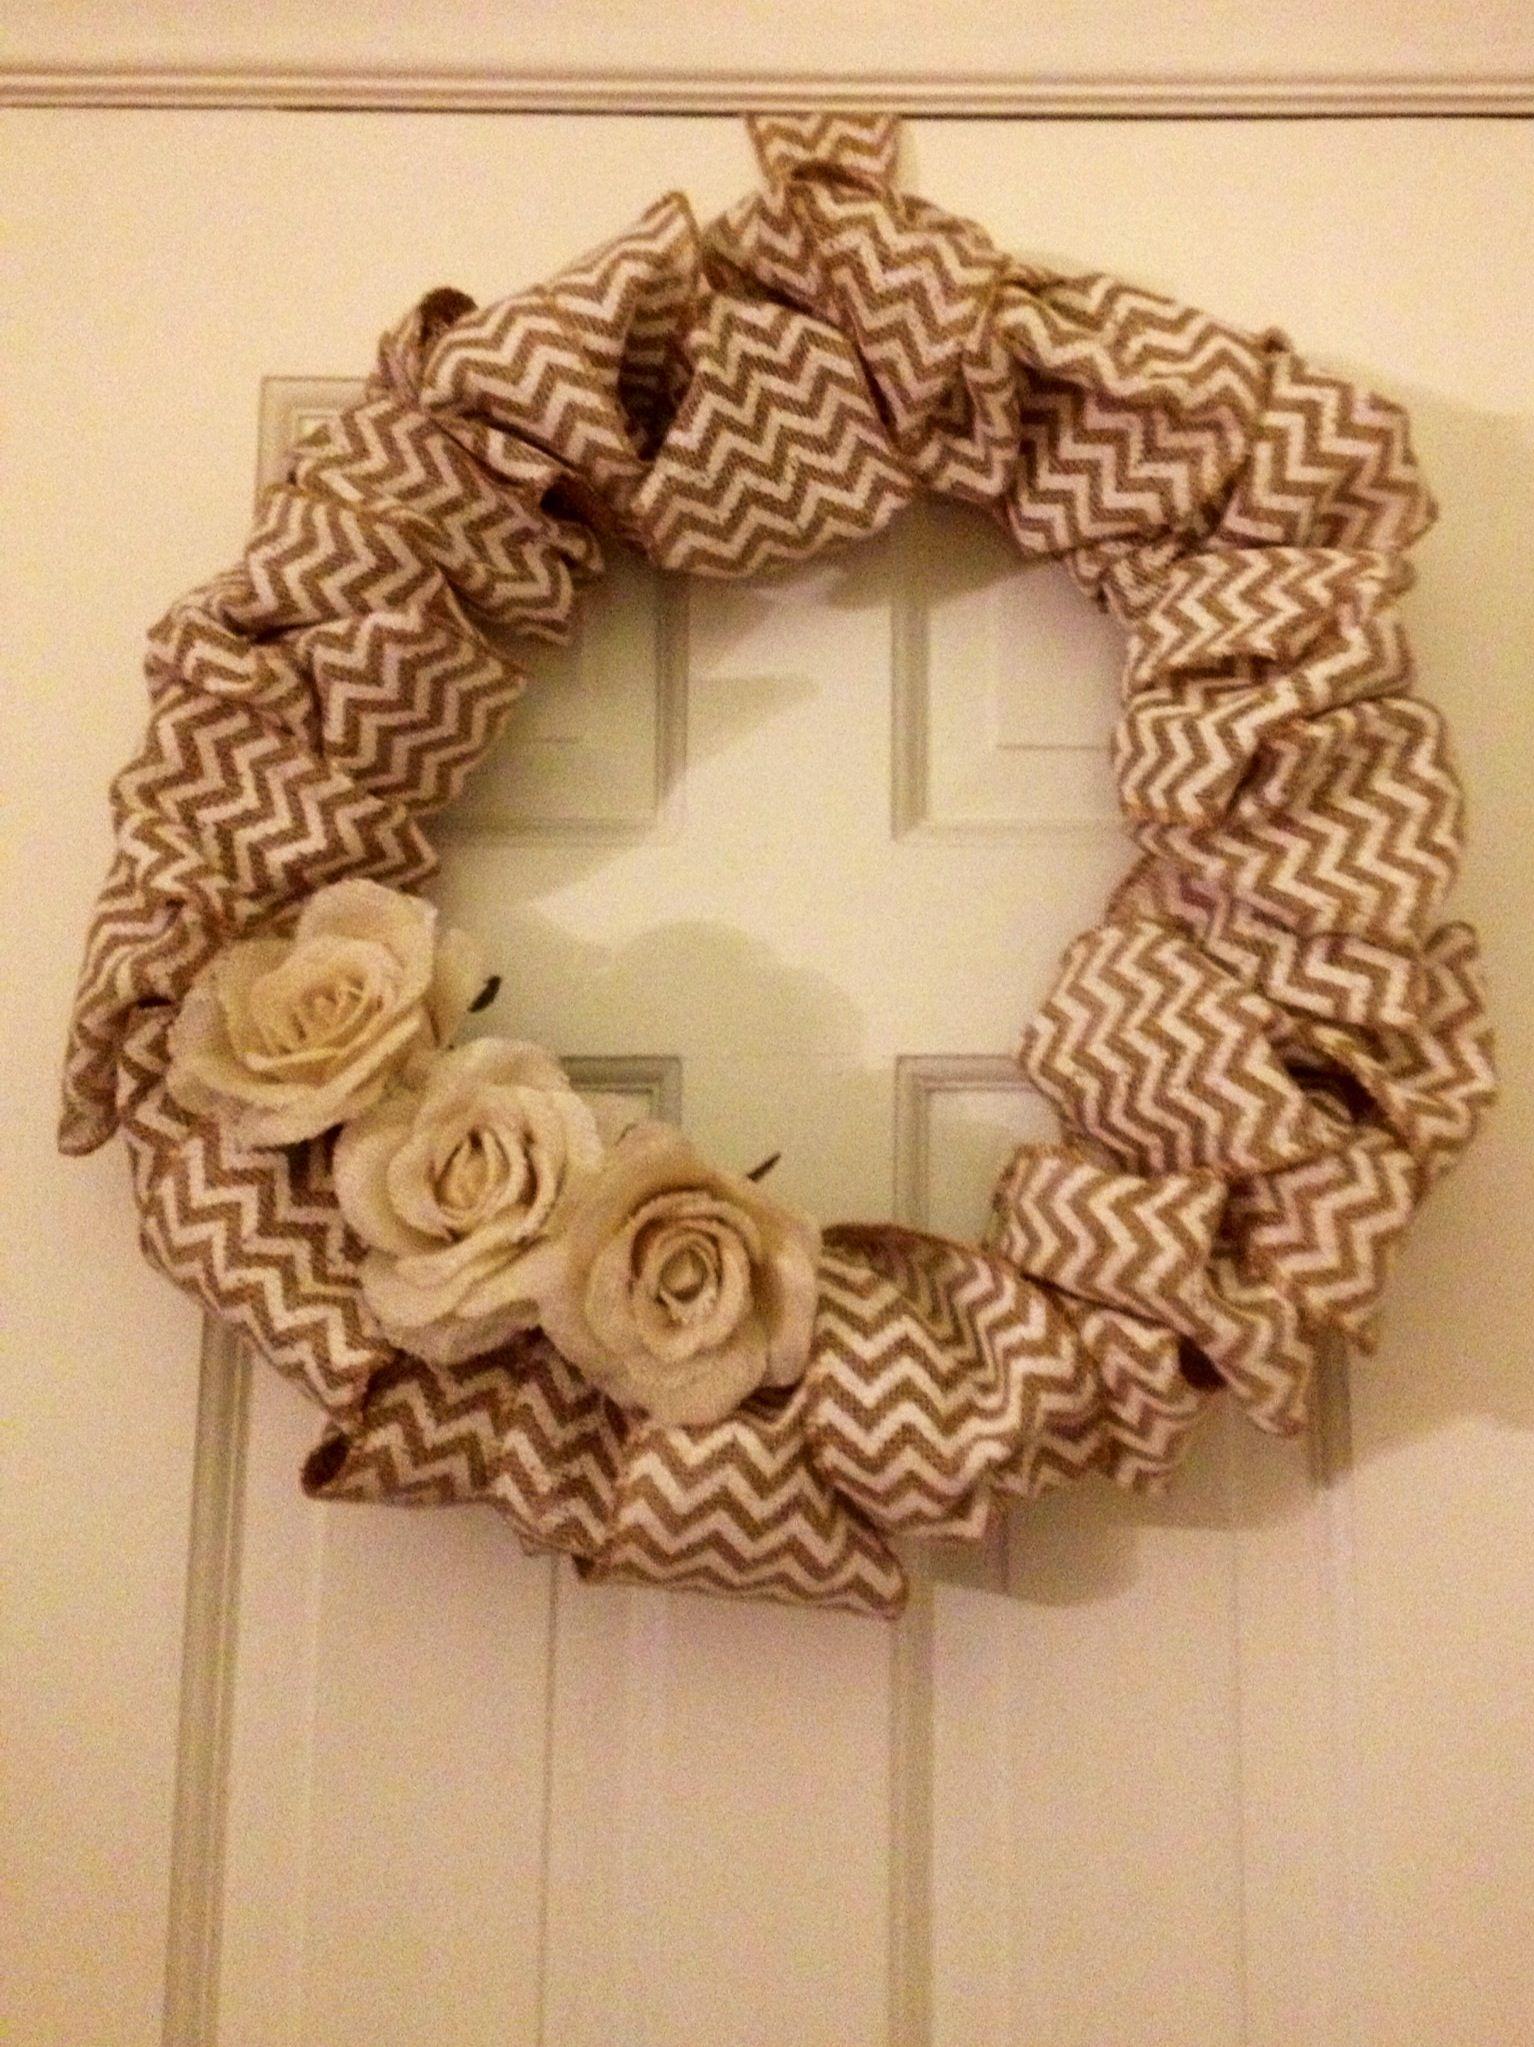 New wreath!